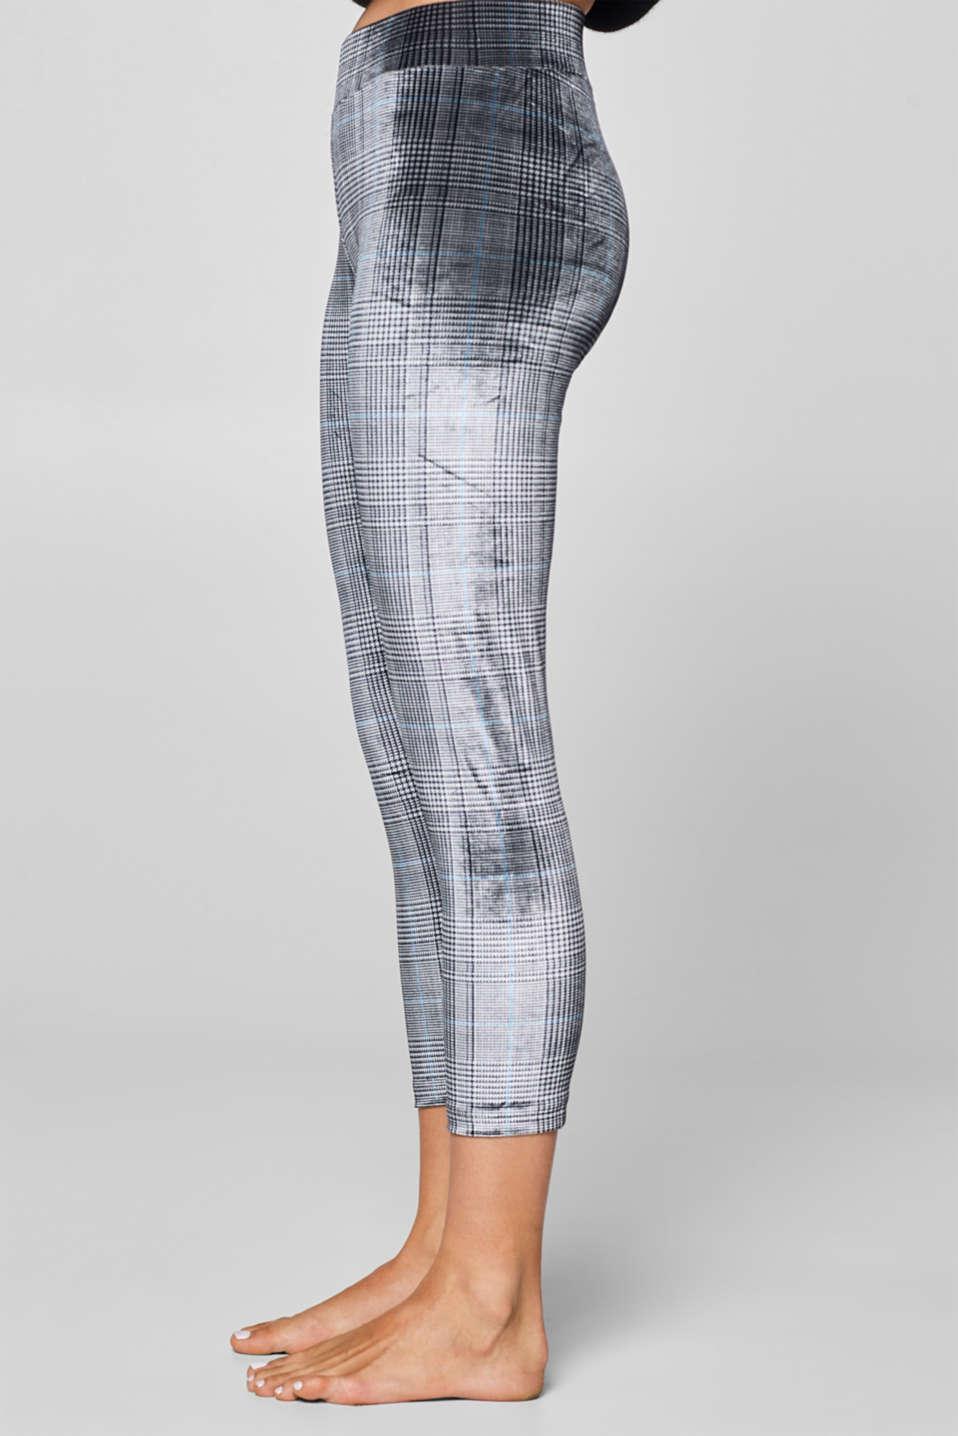 Velvety leggings with a glencheck pattern, LIGHT GREYMELANGE, detail image number 1